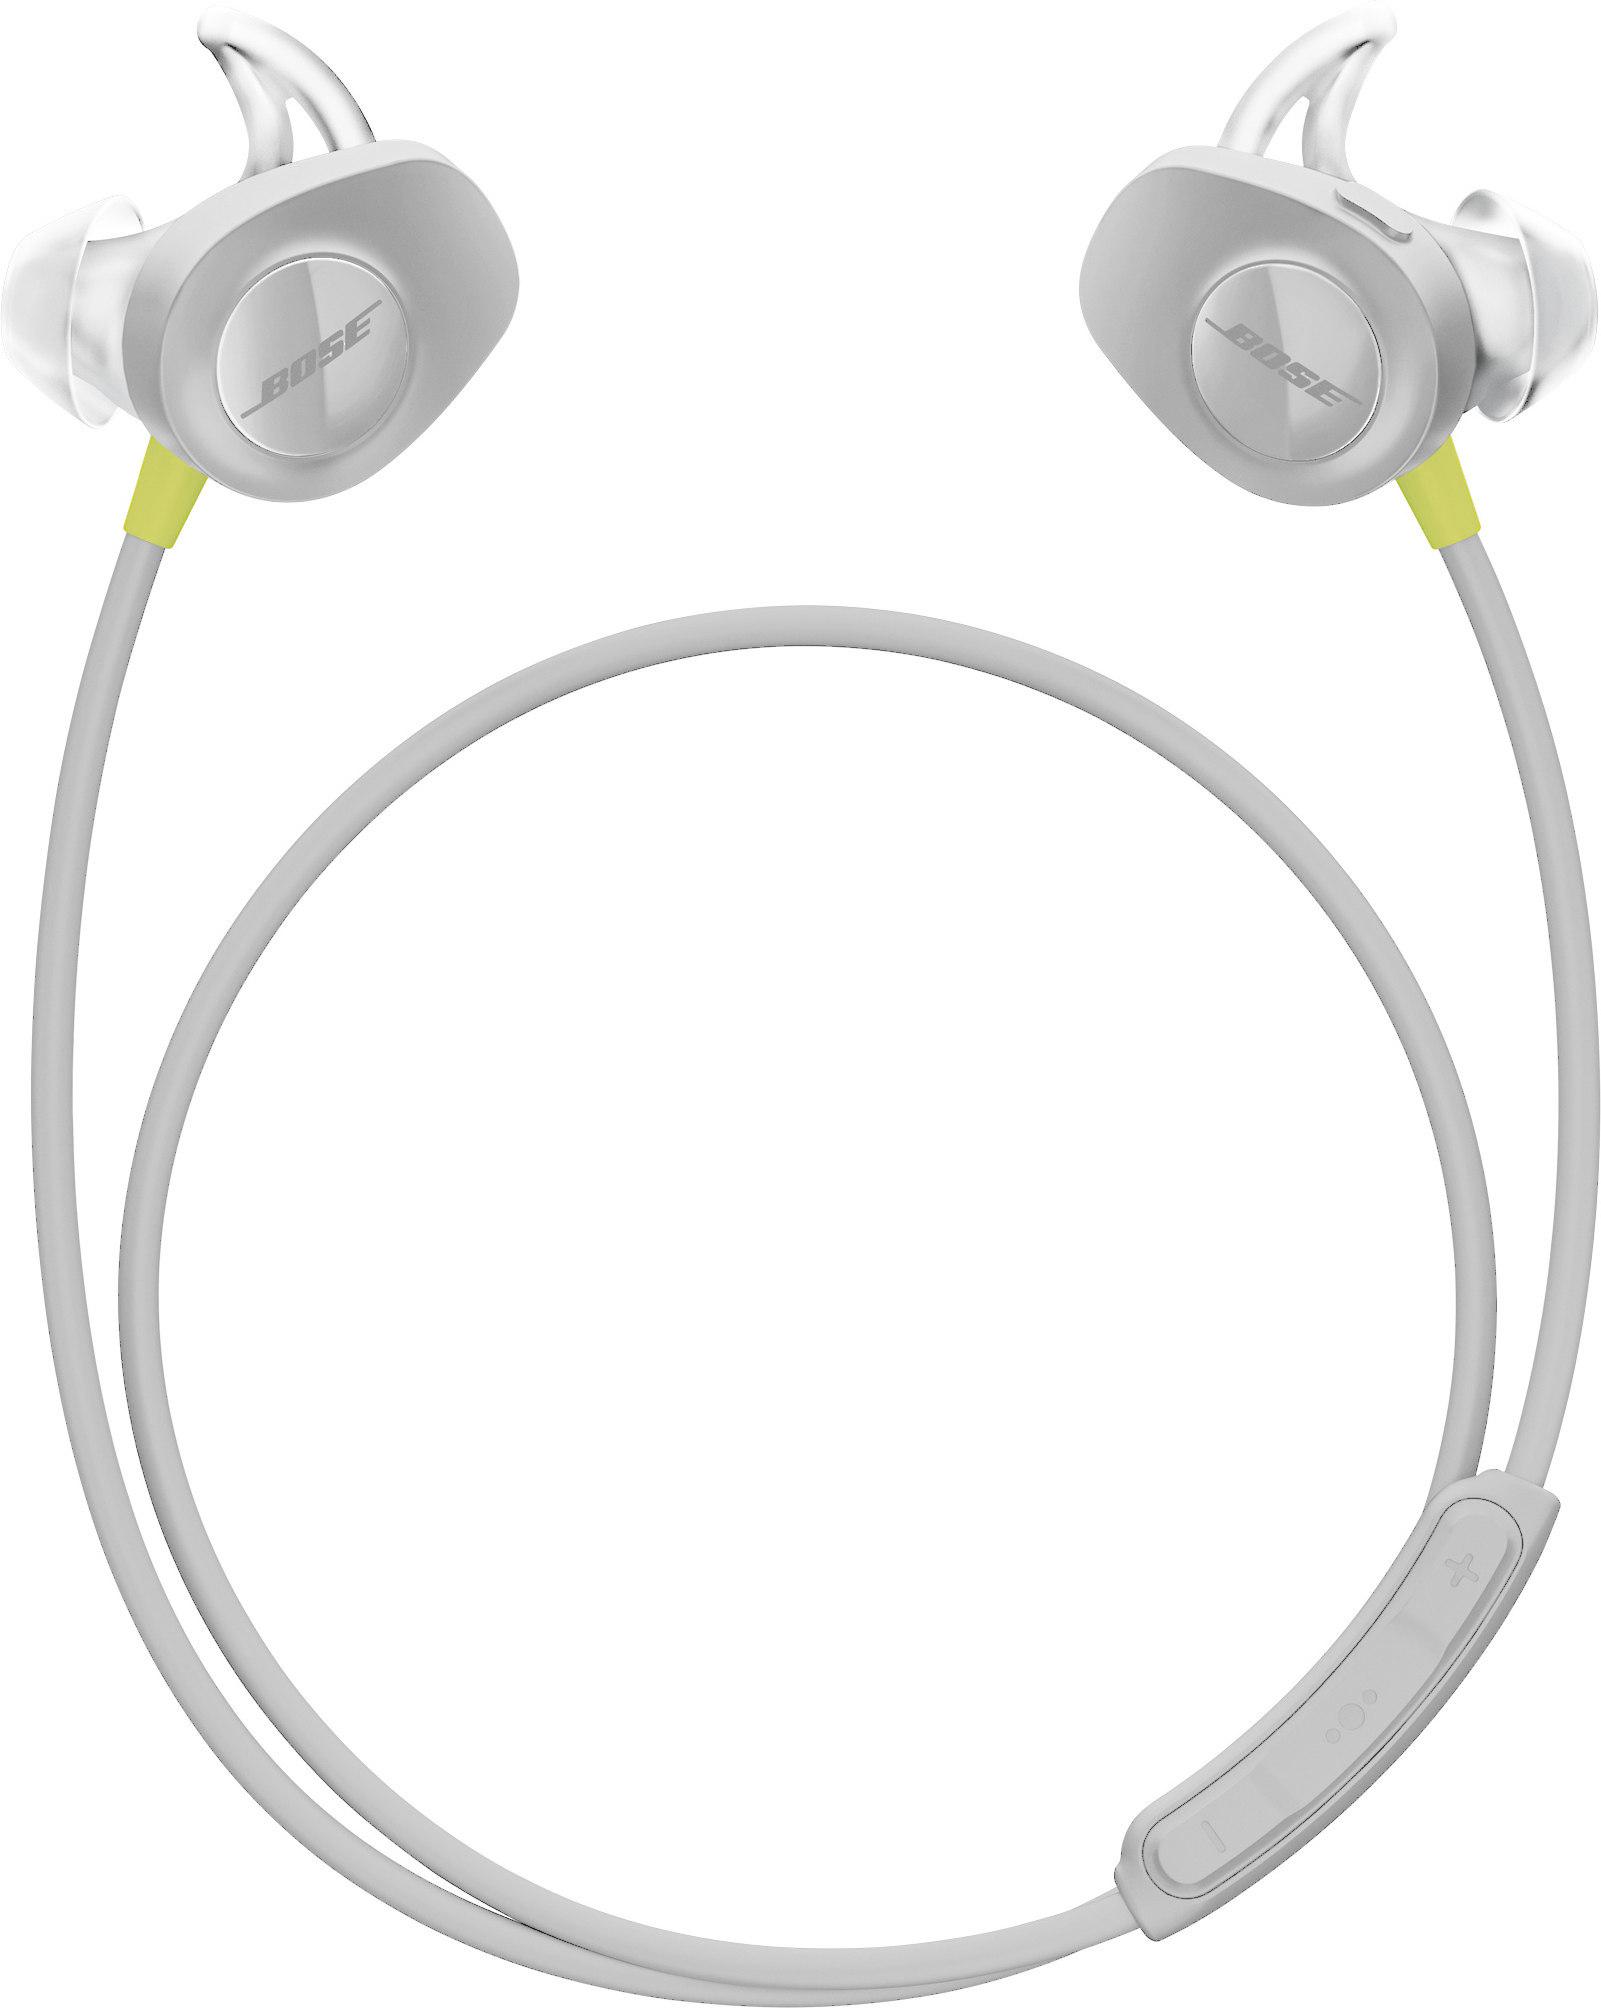 8bd8bb2d73f Bose® SoundSport® wireless headphones (Citron) at Crutchfield.com